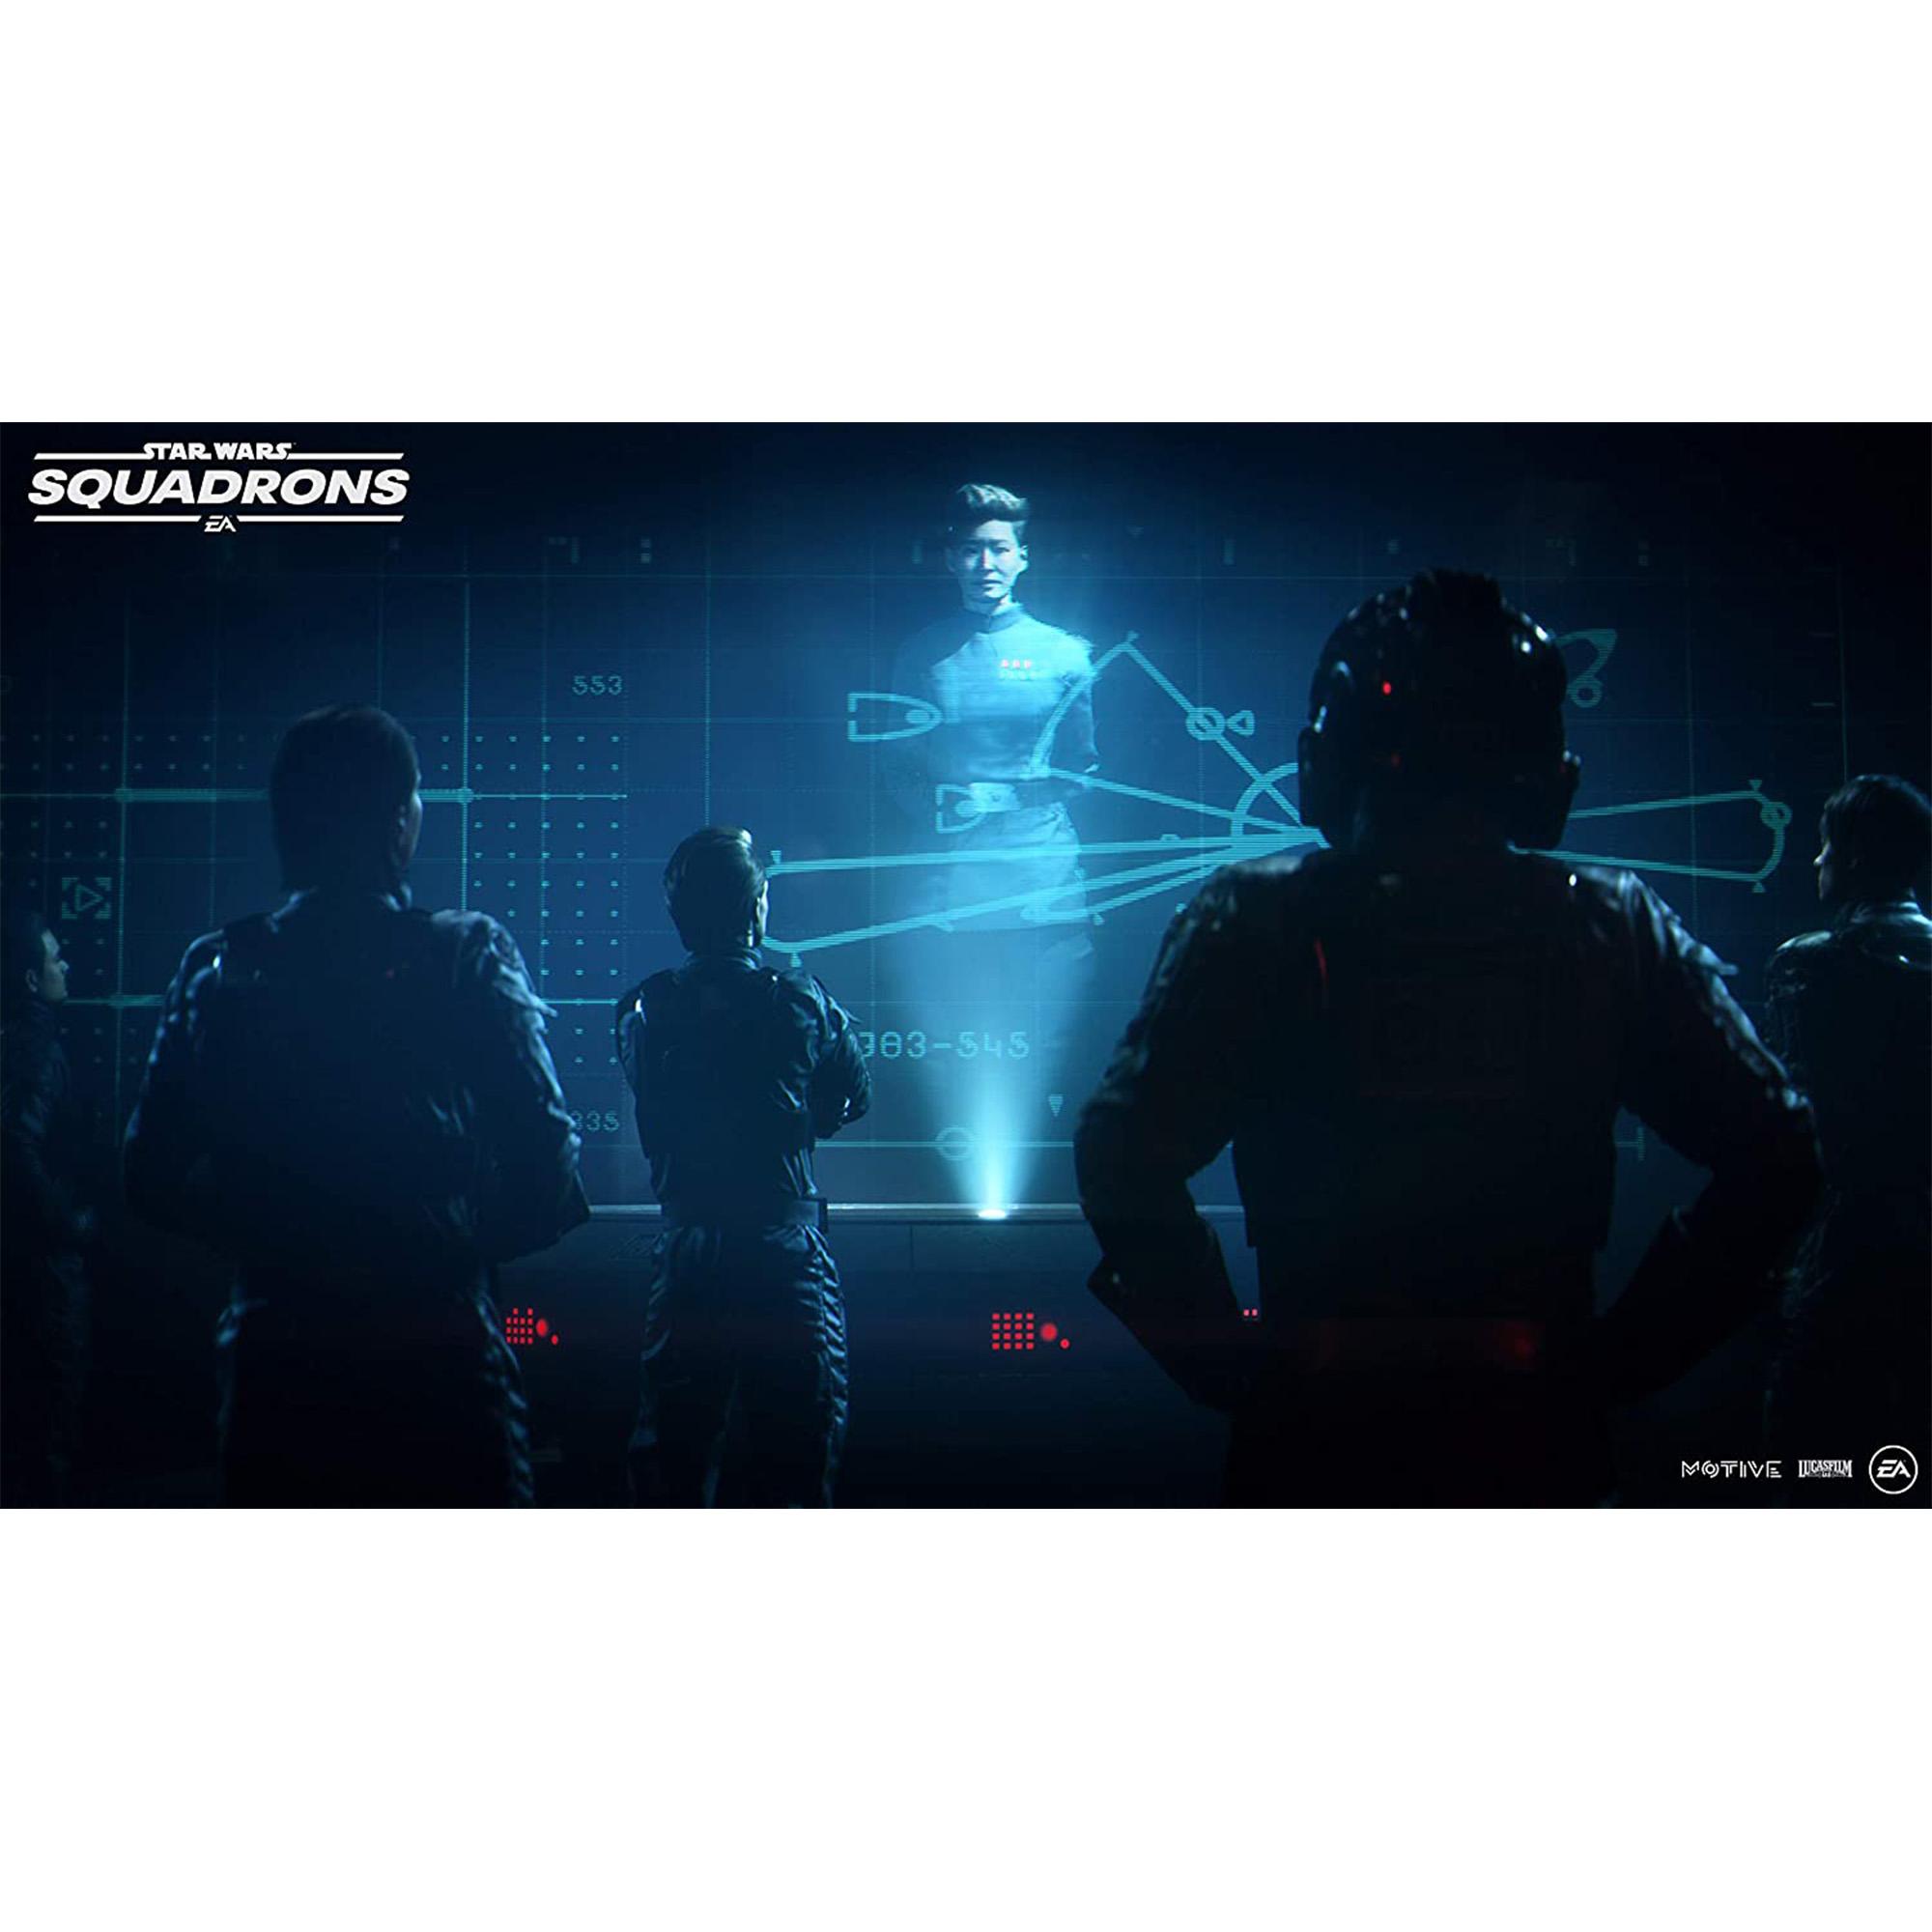 Star Wars Squadrons - Playstation 4 - Mídia Física